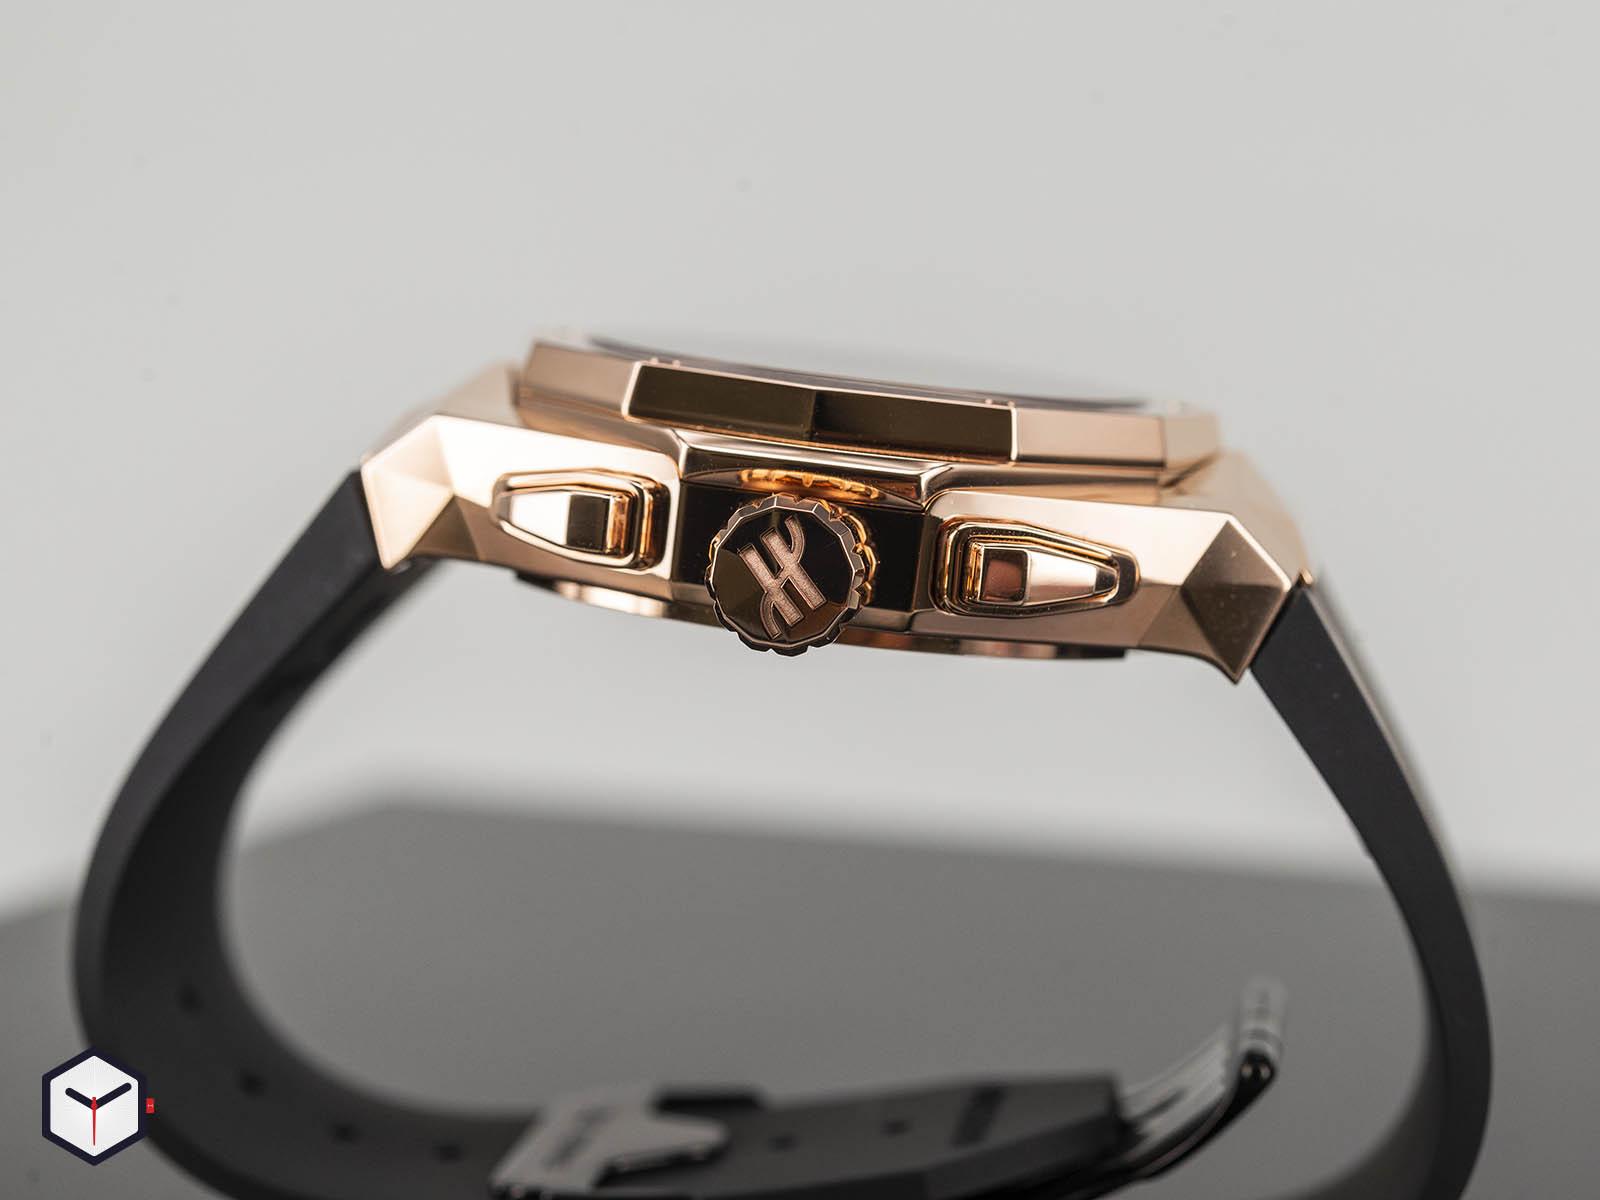 525-ox-0180-rx-orl18-hublot-classic-fusion-aerofusion-chronograph-orlinski-king-gold-4.jpg